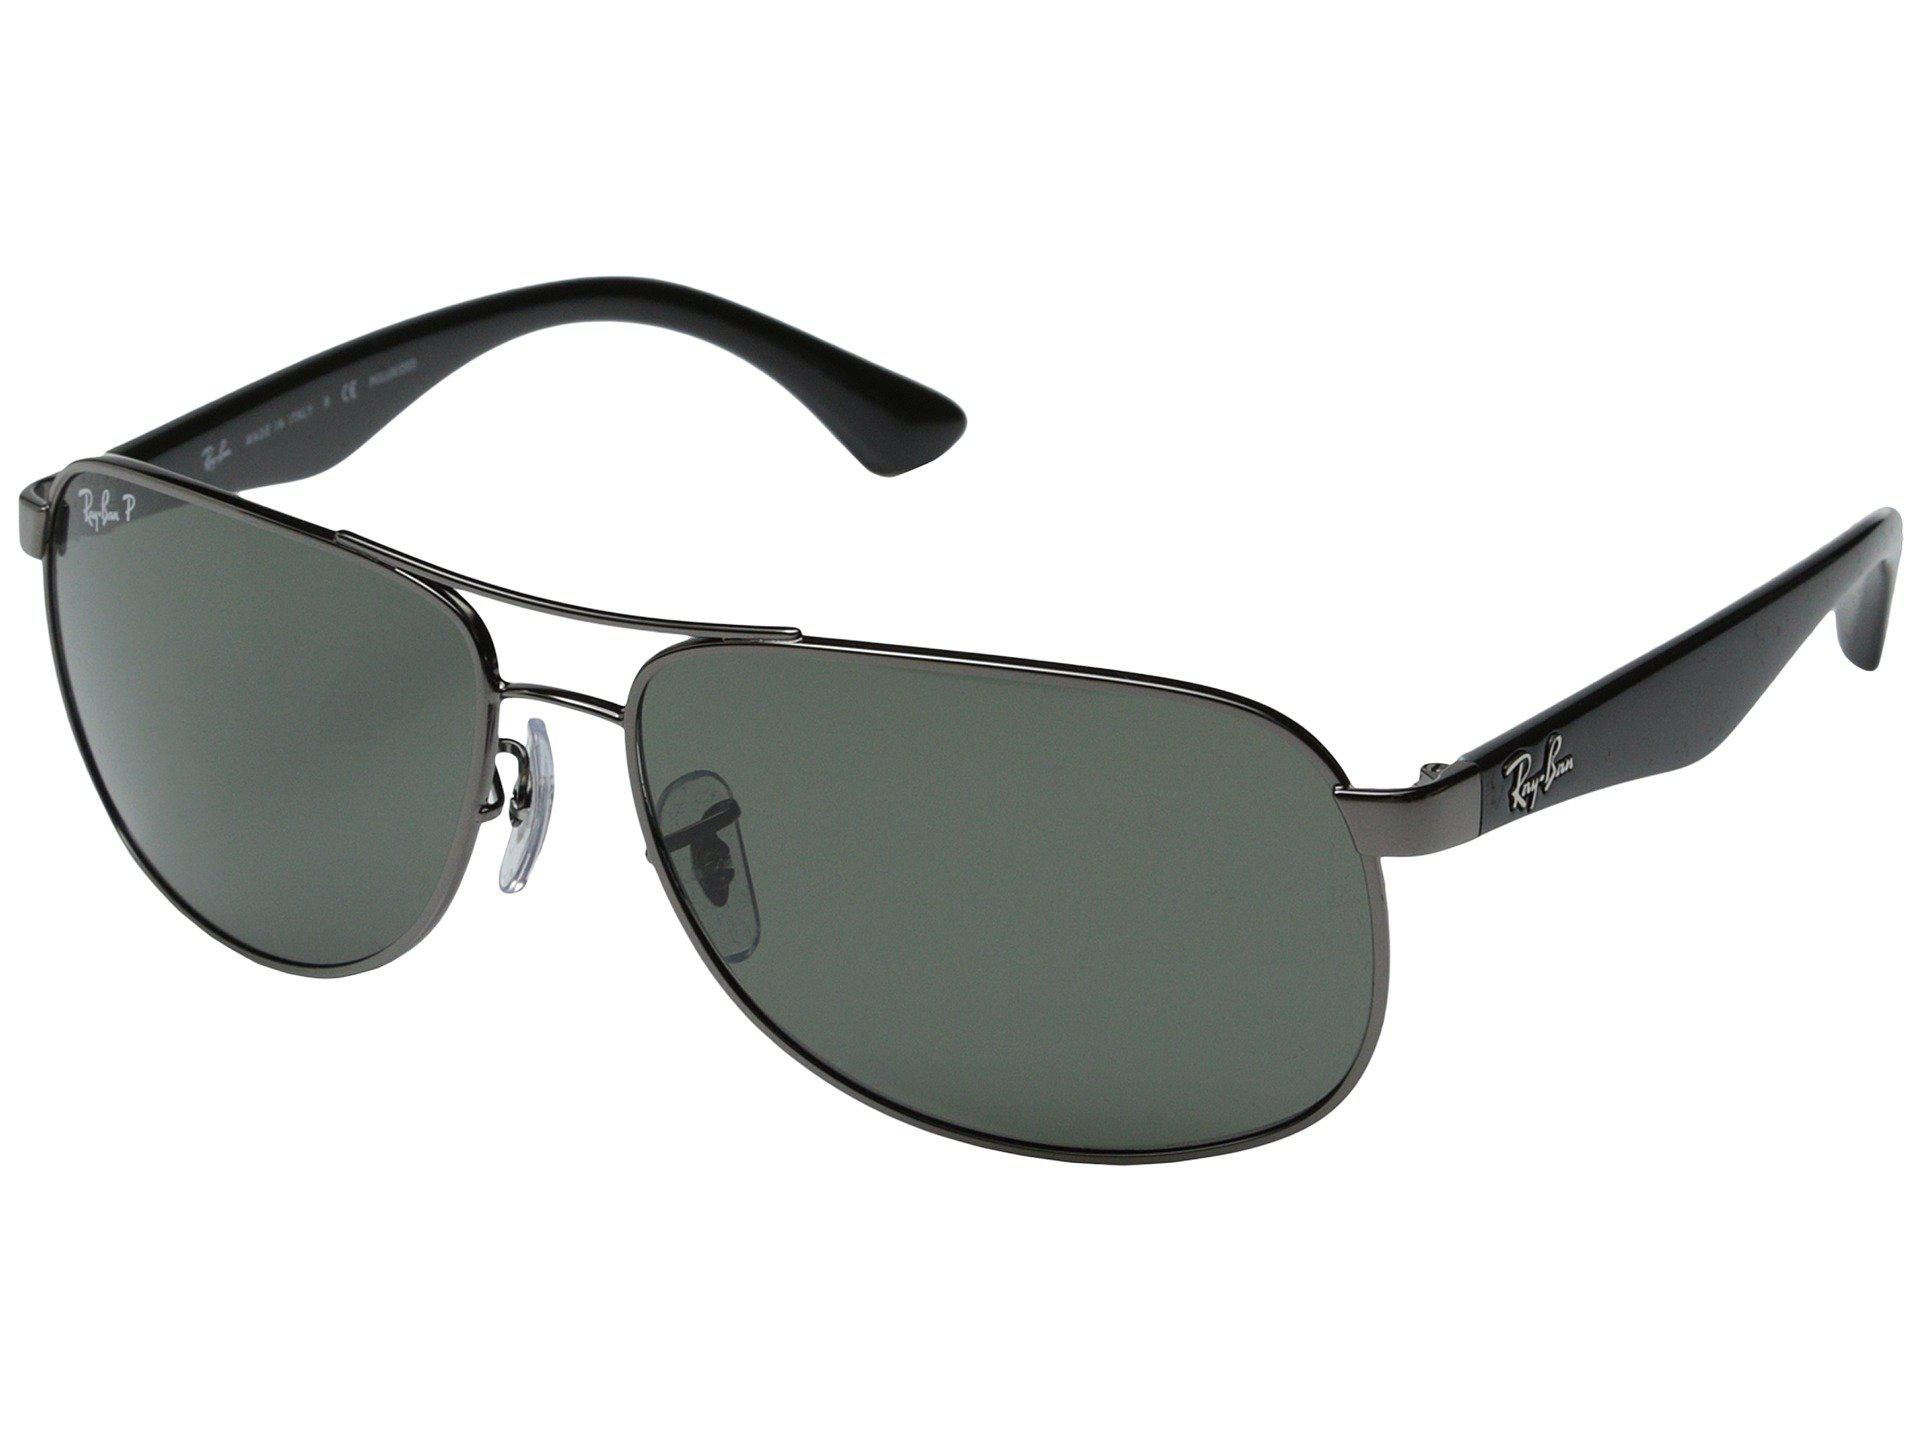 3546e3dd99 Ray-Ban. Black Rb3502 Polarized 61mm (gunmental polarized) Polarized  Fashion Sunglasses